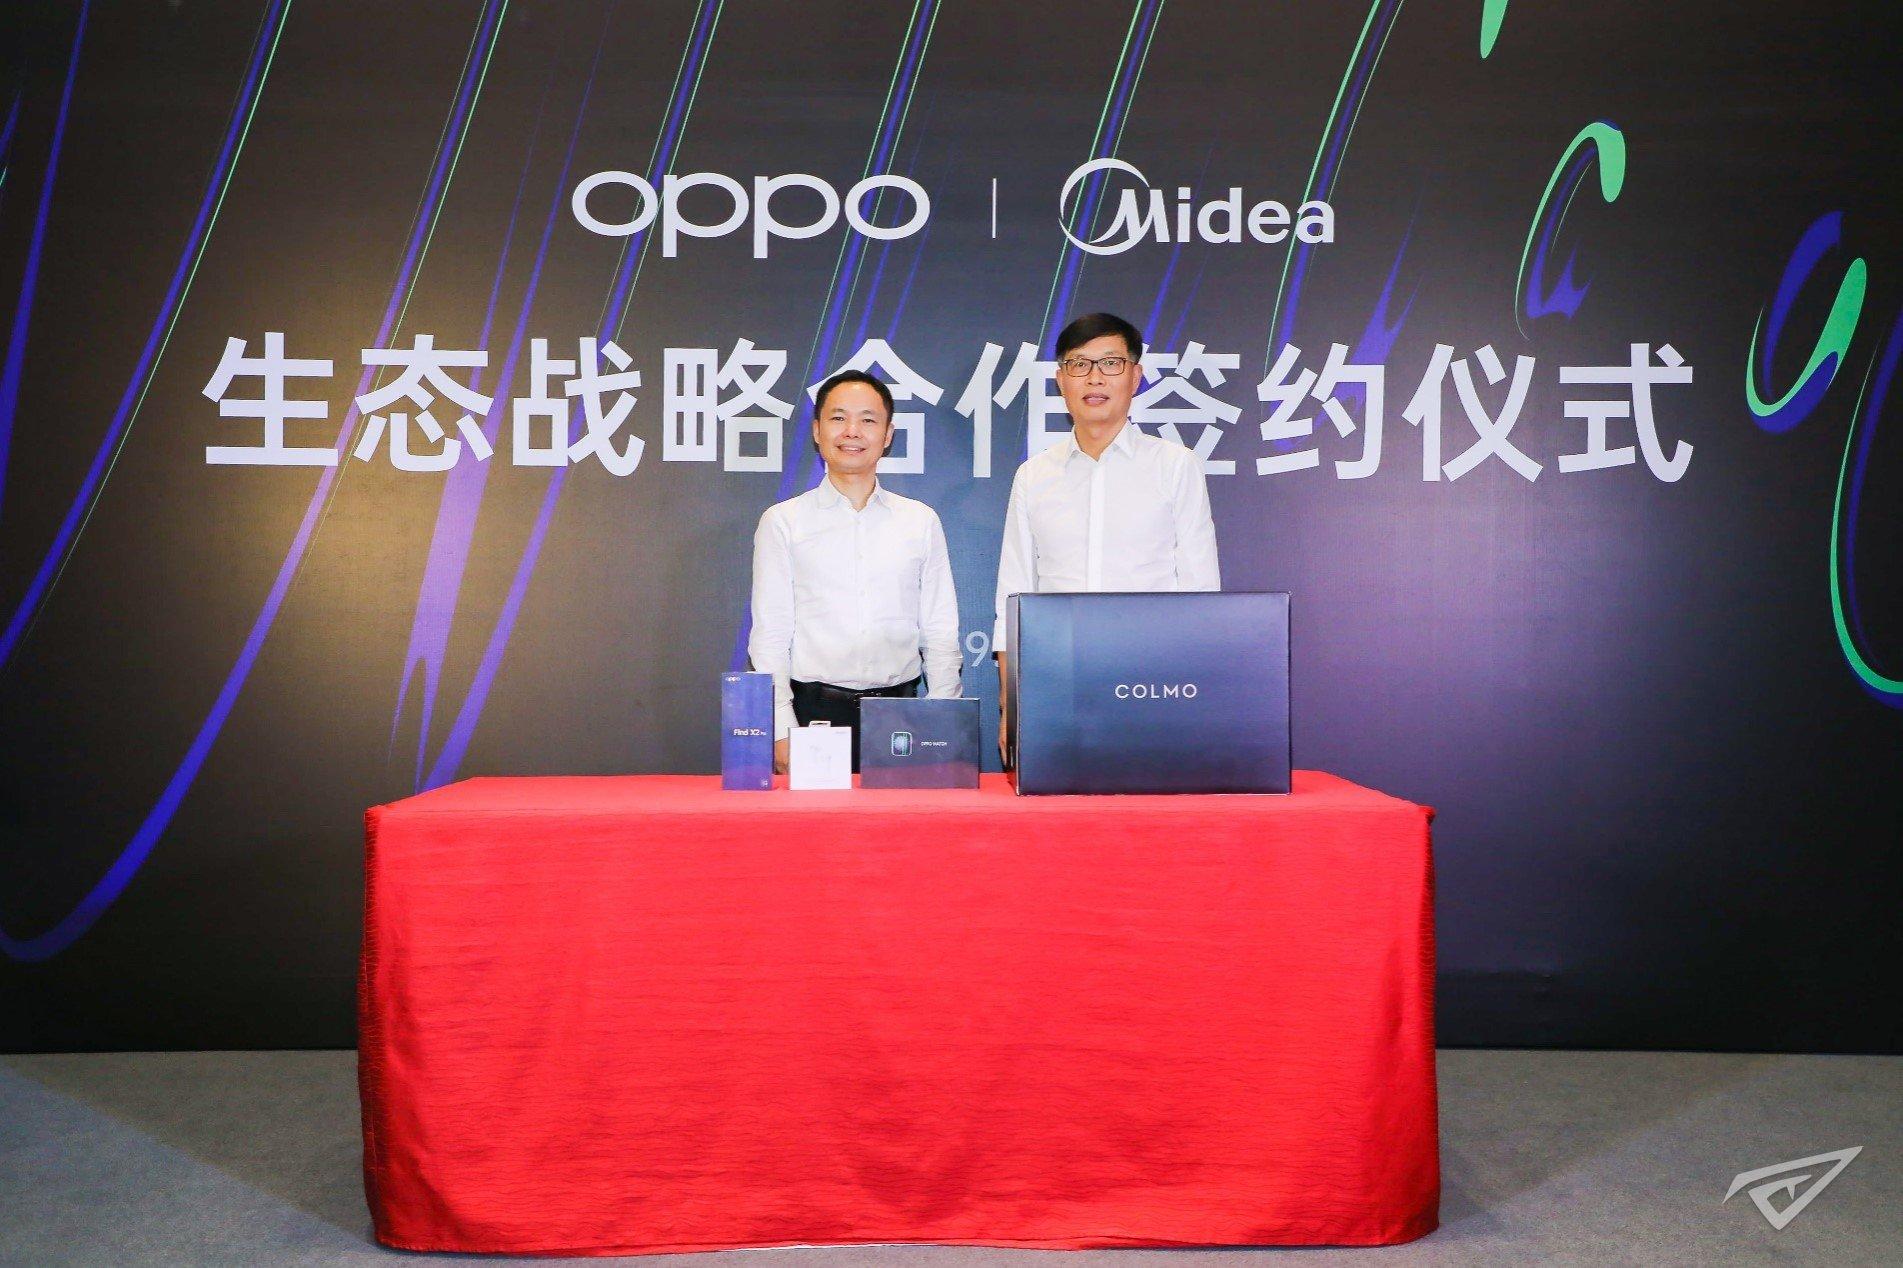 OPPO美的达成战略合作,以开放生态共赢5G+IoT时代